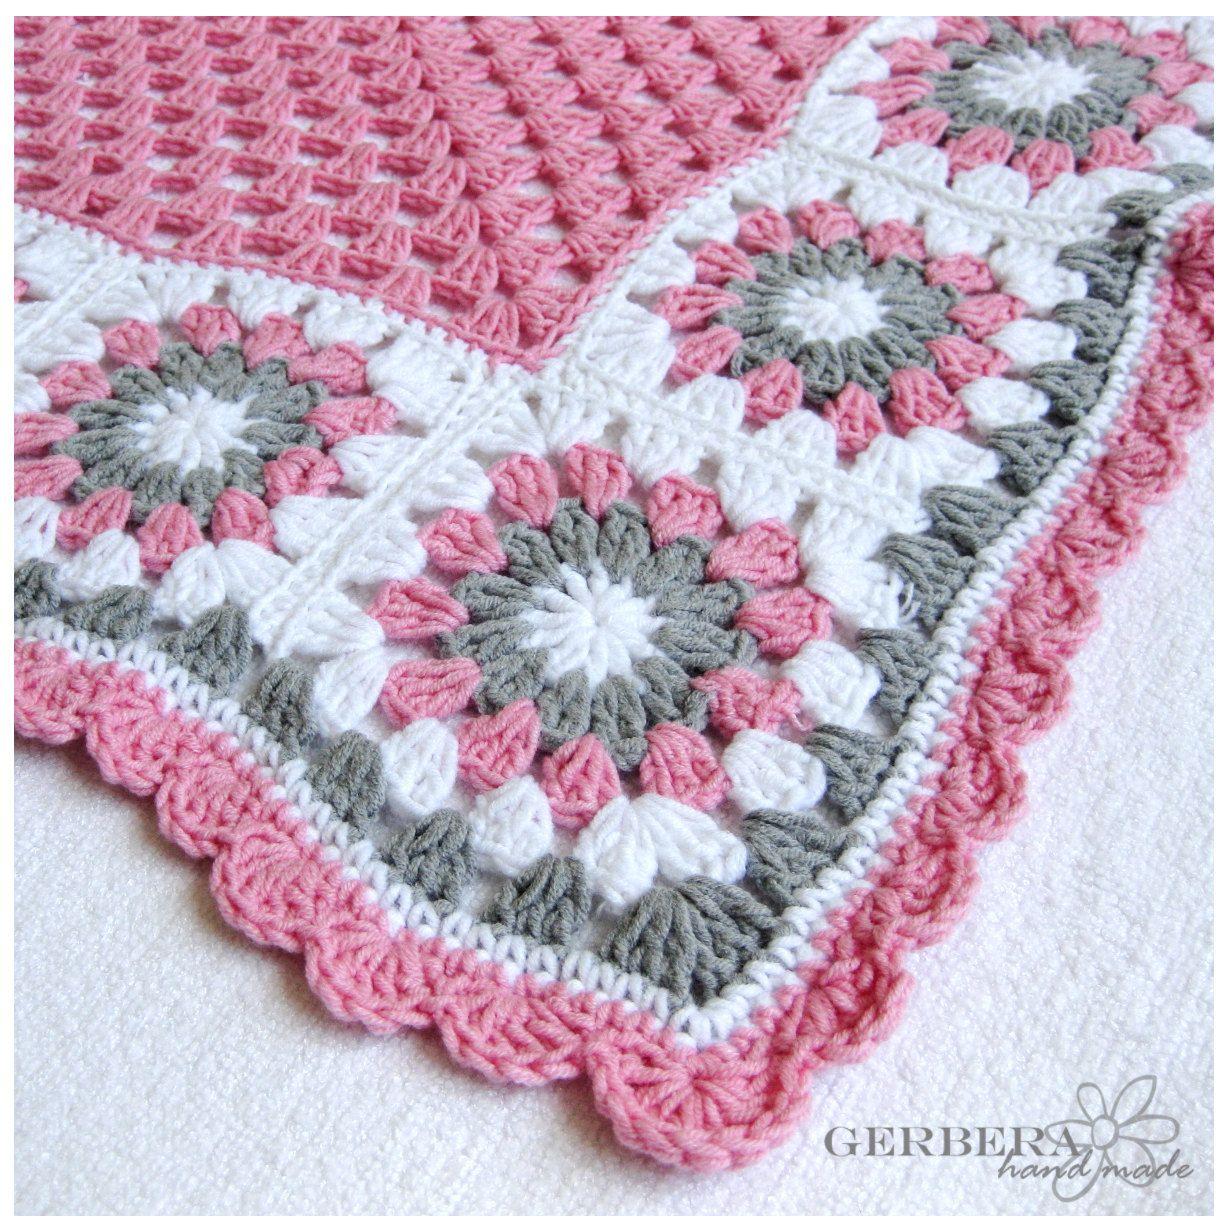 Vintage Baby Afghan granny square infant girl blanket nursery decor pink yellow green white bedding handmade crocheted